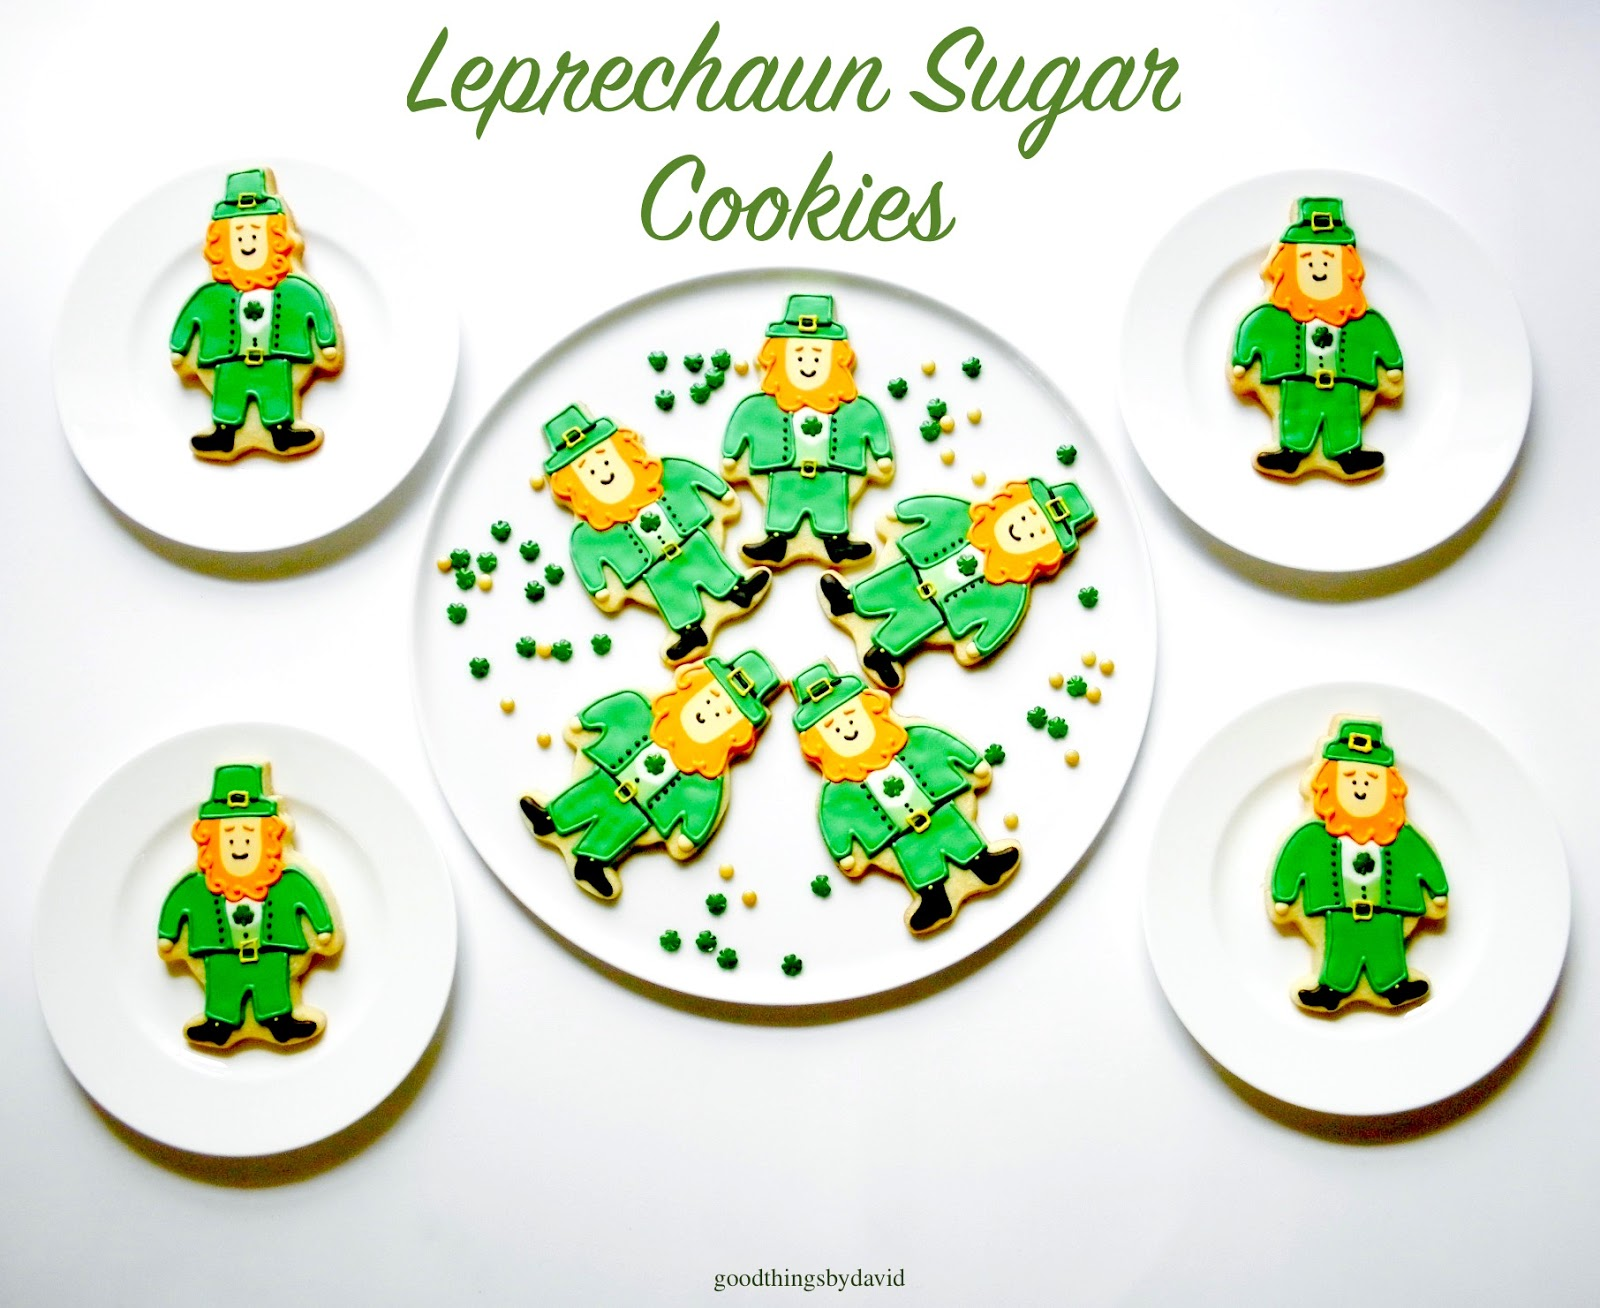 Good Things by David: Leprechaun Sugar Cookies